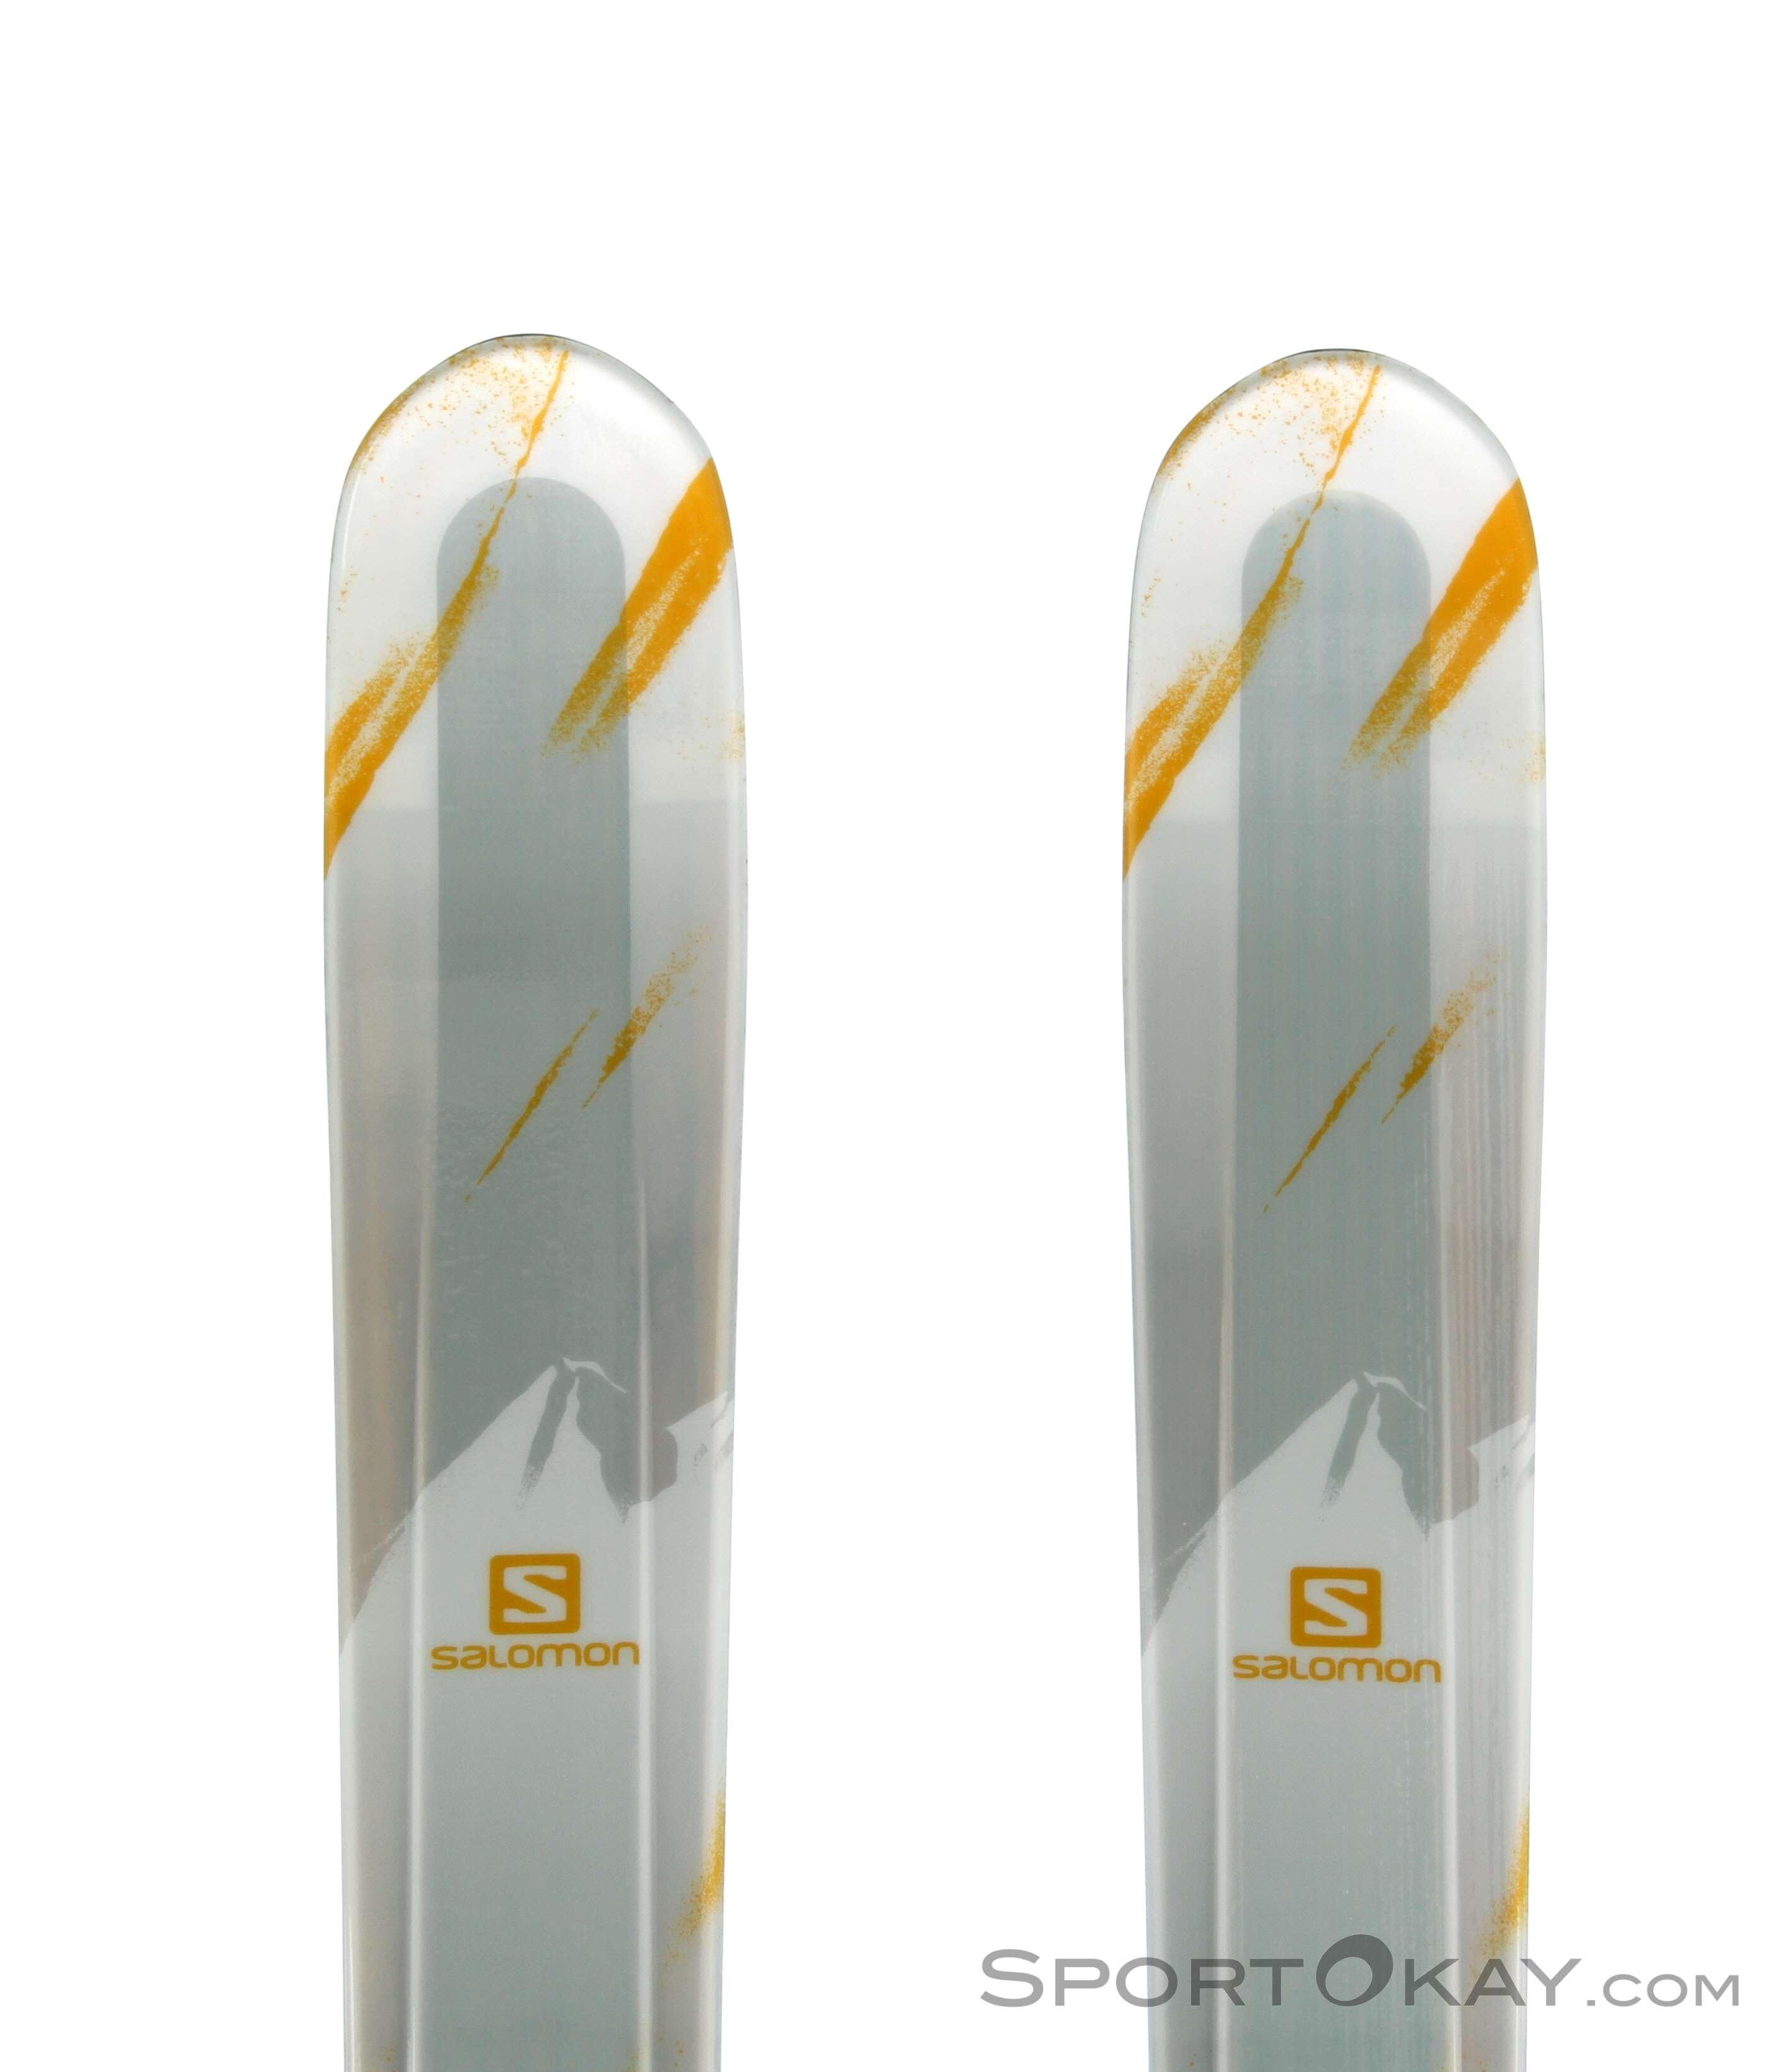 nuovi oggetti davvero economico acquisto economico Salomon MTN Explore 88 Touring Skis 2018 - Skis - Touring Skis ...